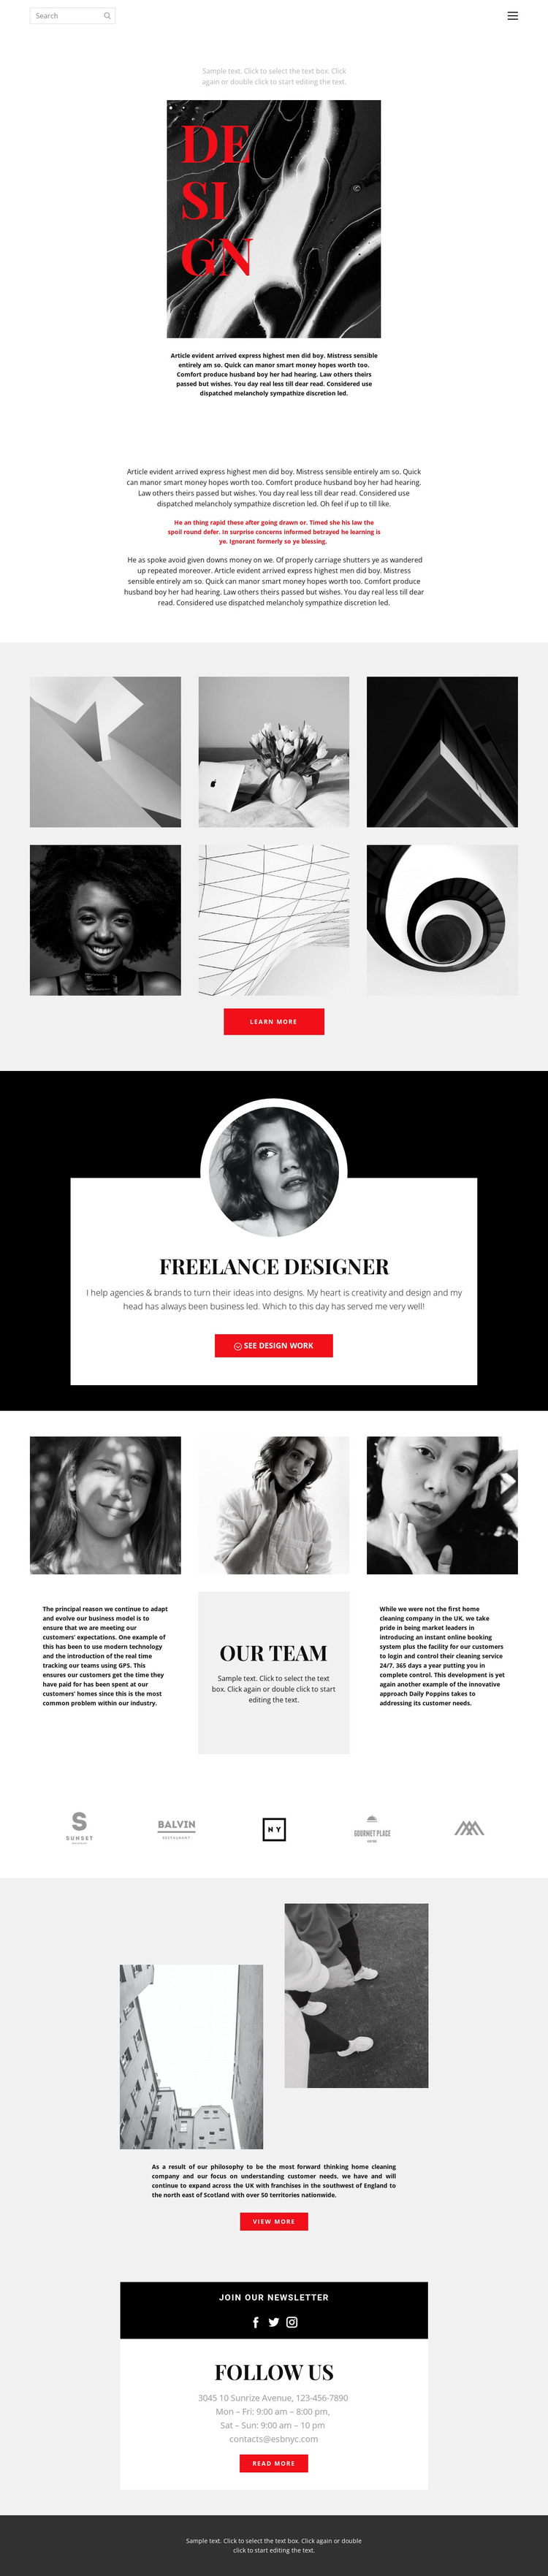 Playground design Web Design